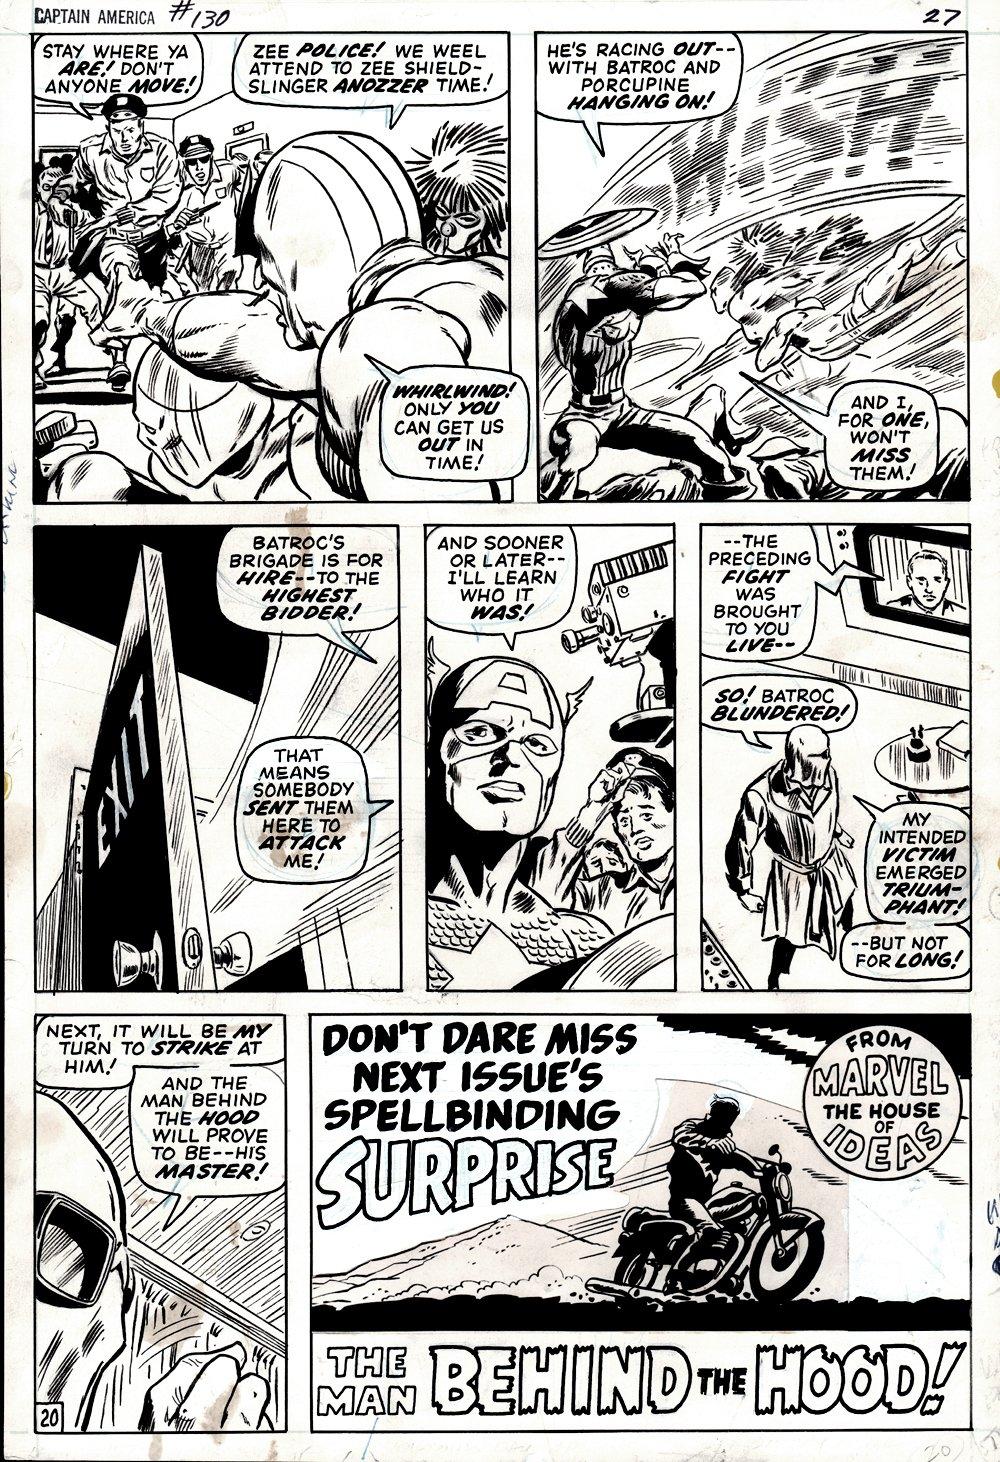 Captain America #130 p 20 (Captain America, The Hood, Batroc, Whirlwind, Porcupine!) 1970